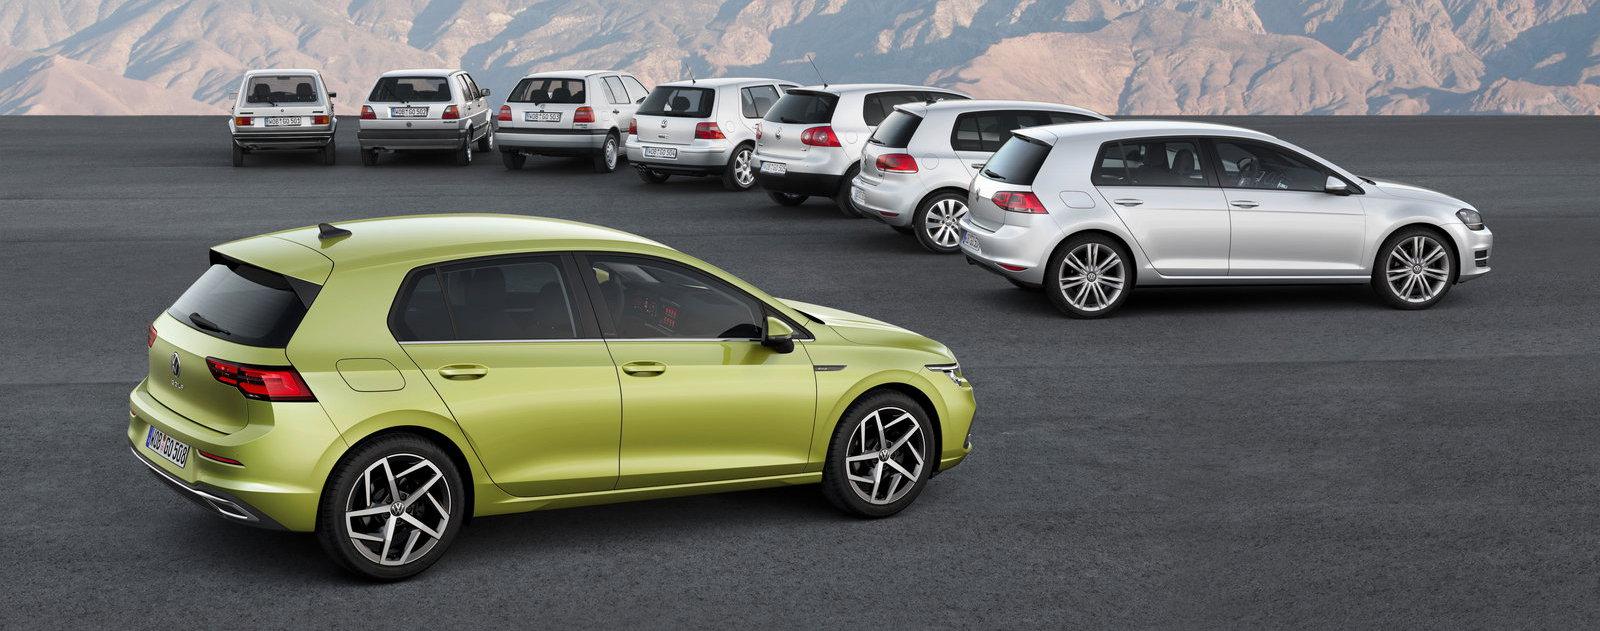 VW GOLF 2020 56